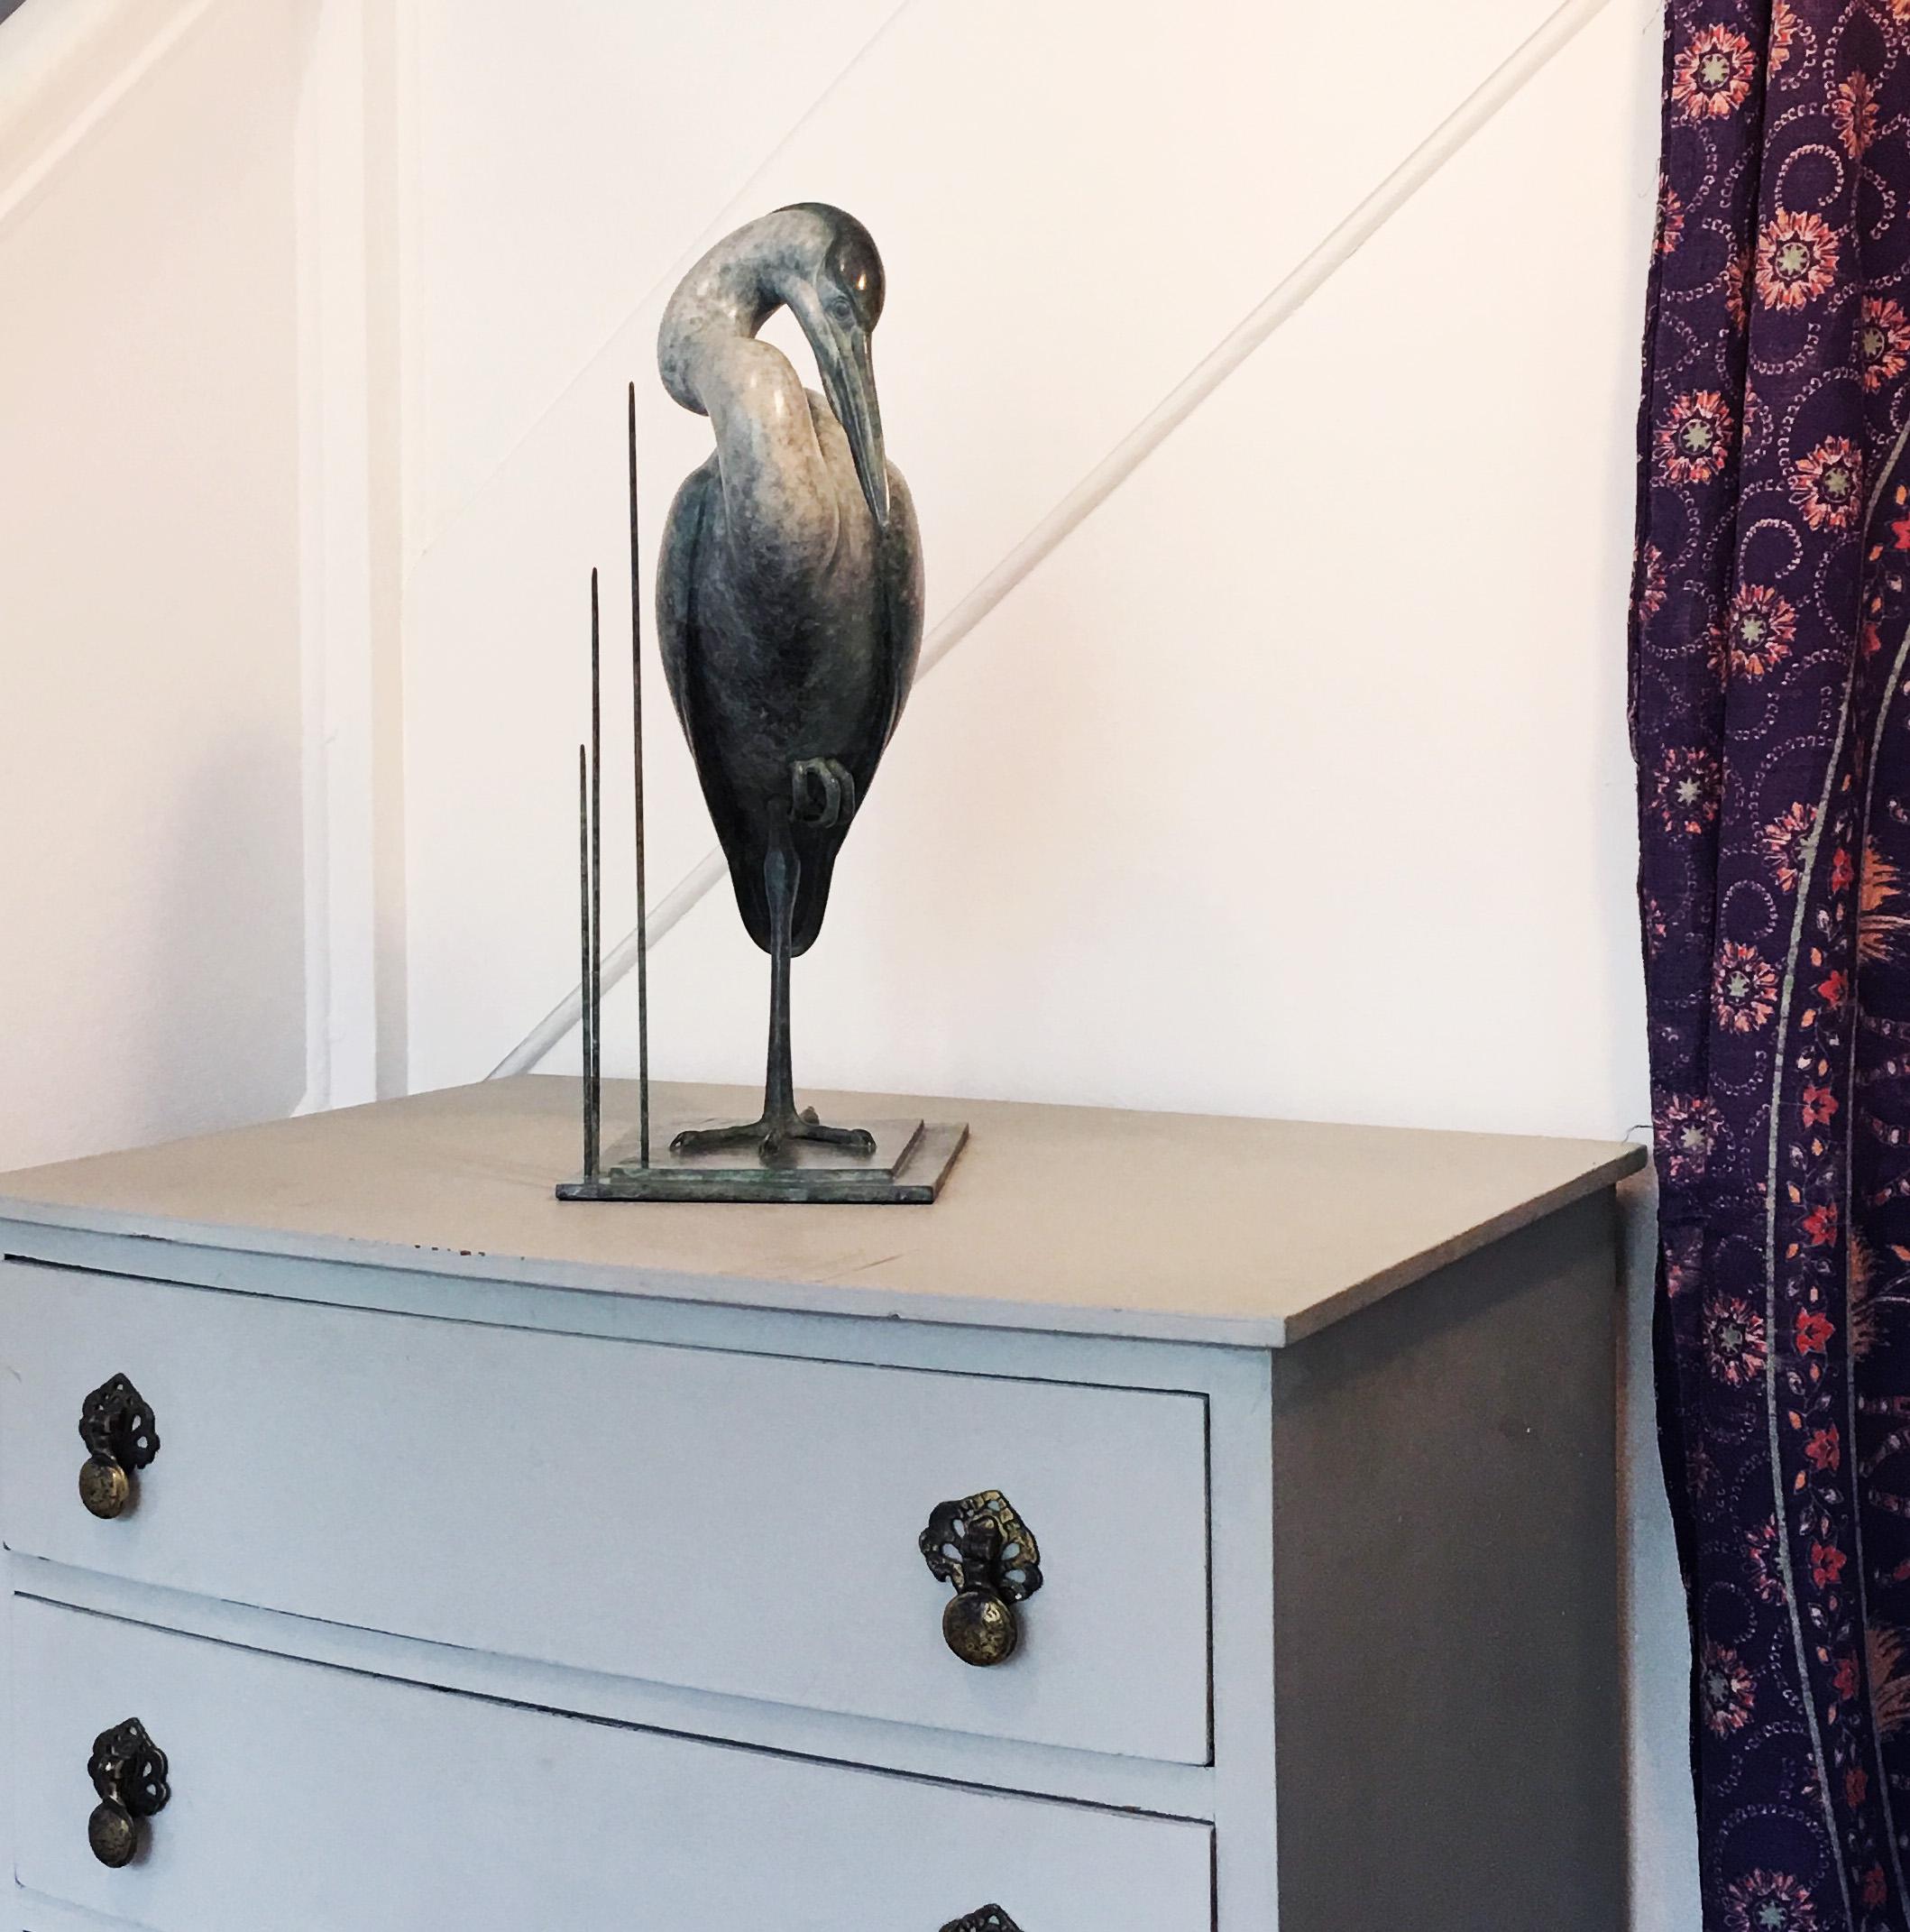 Small Heron Sophie Louise White 6